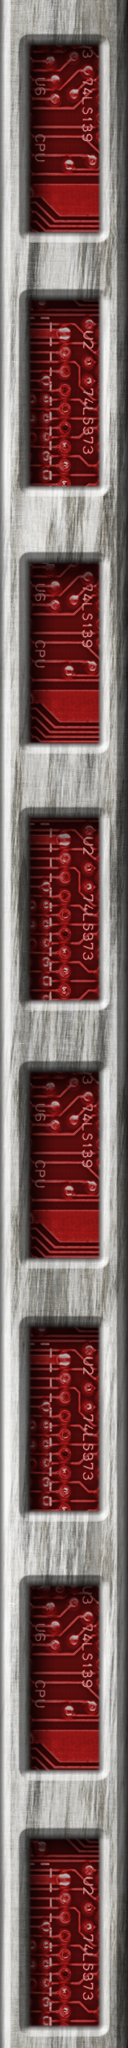 Red KeyCard Door Edge by Hoover1979